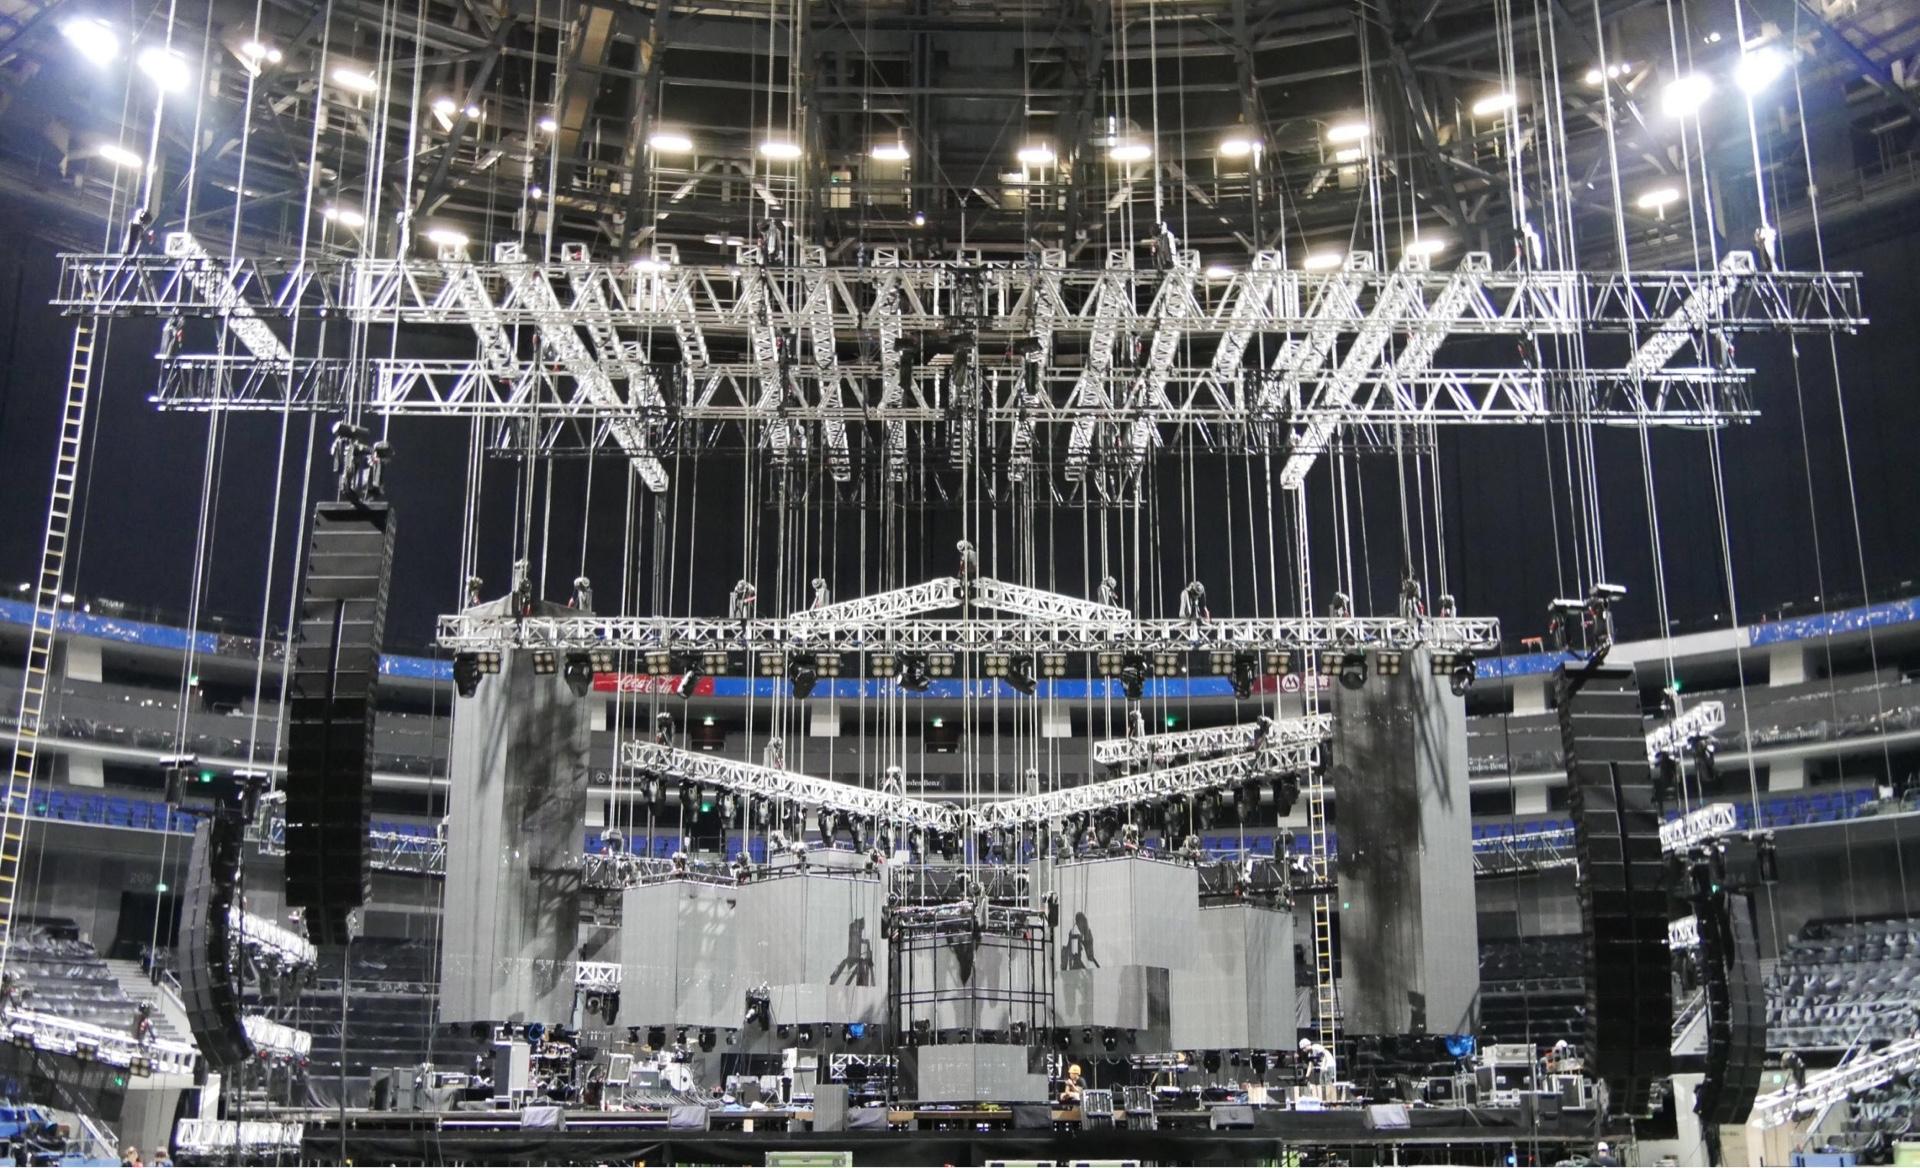 1. Rooftop คอนเสิร์ตที่ใหญ่ที่สุดแห่งแรกในเมืองไทย